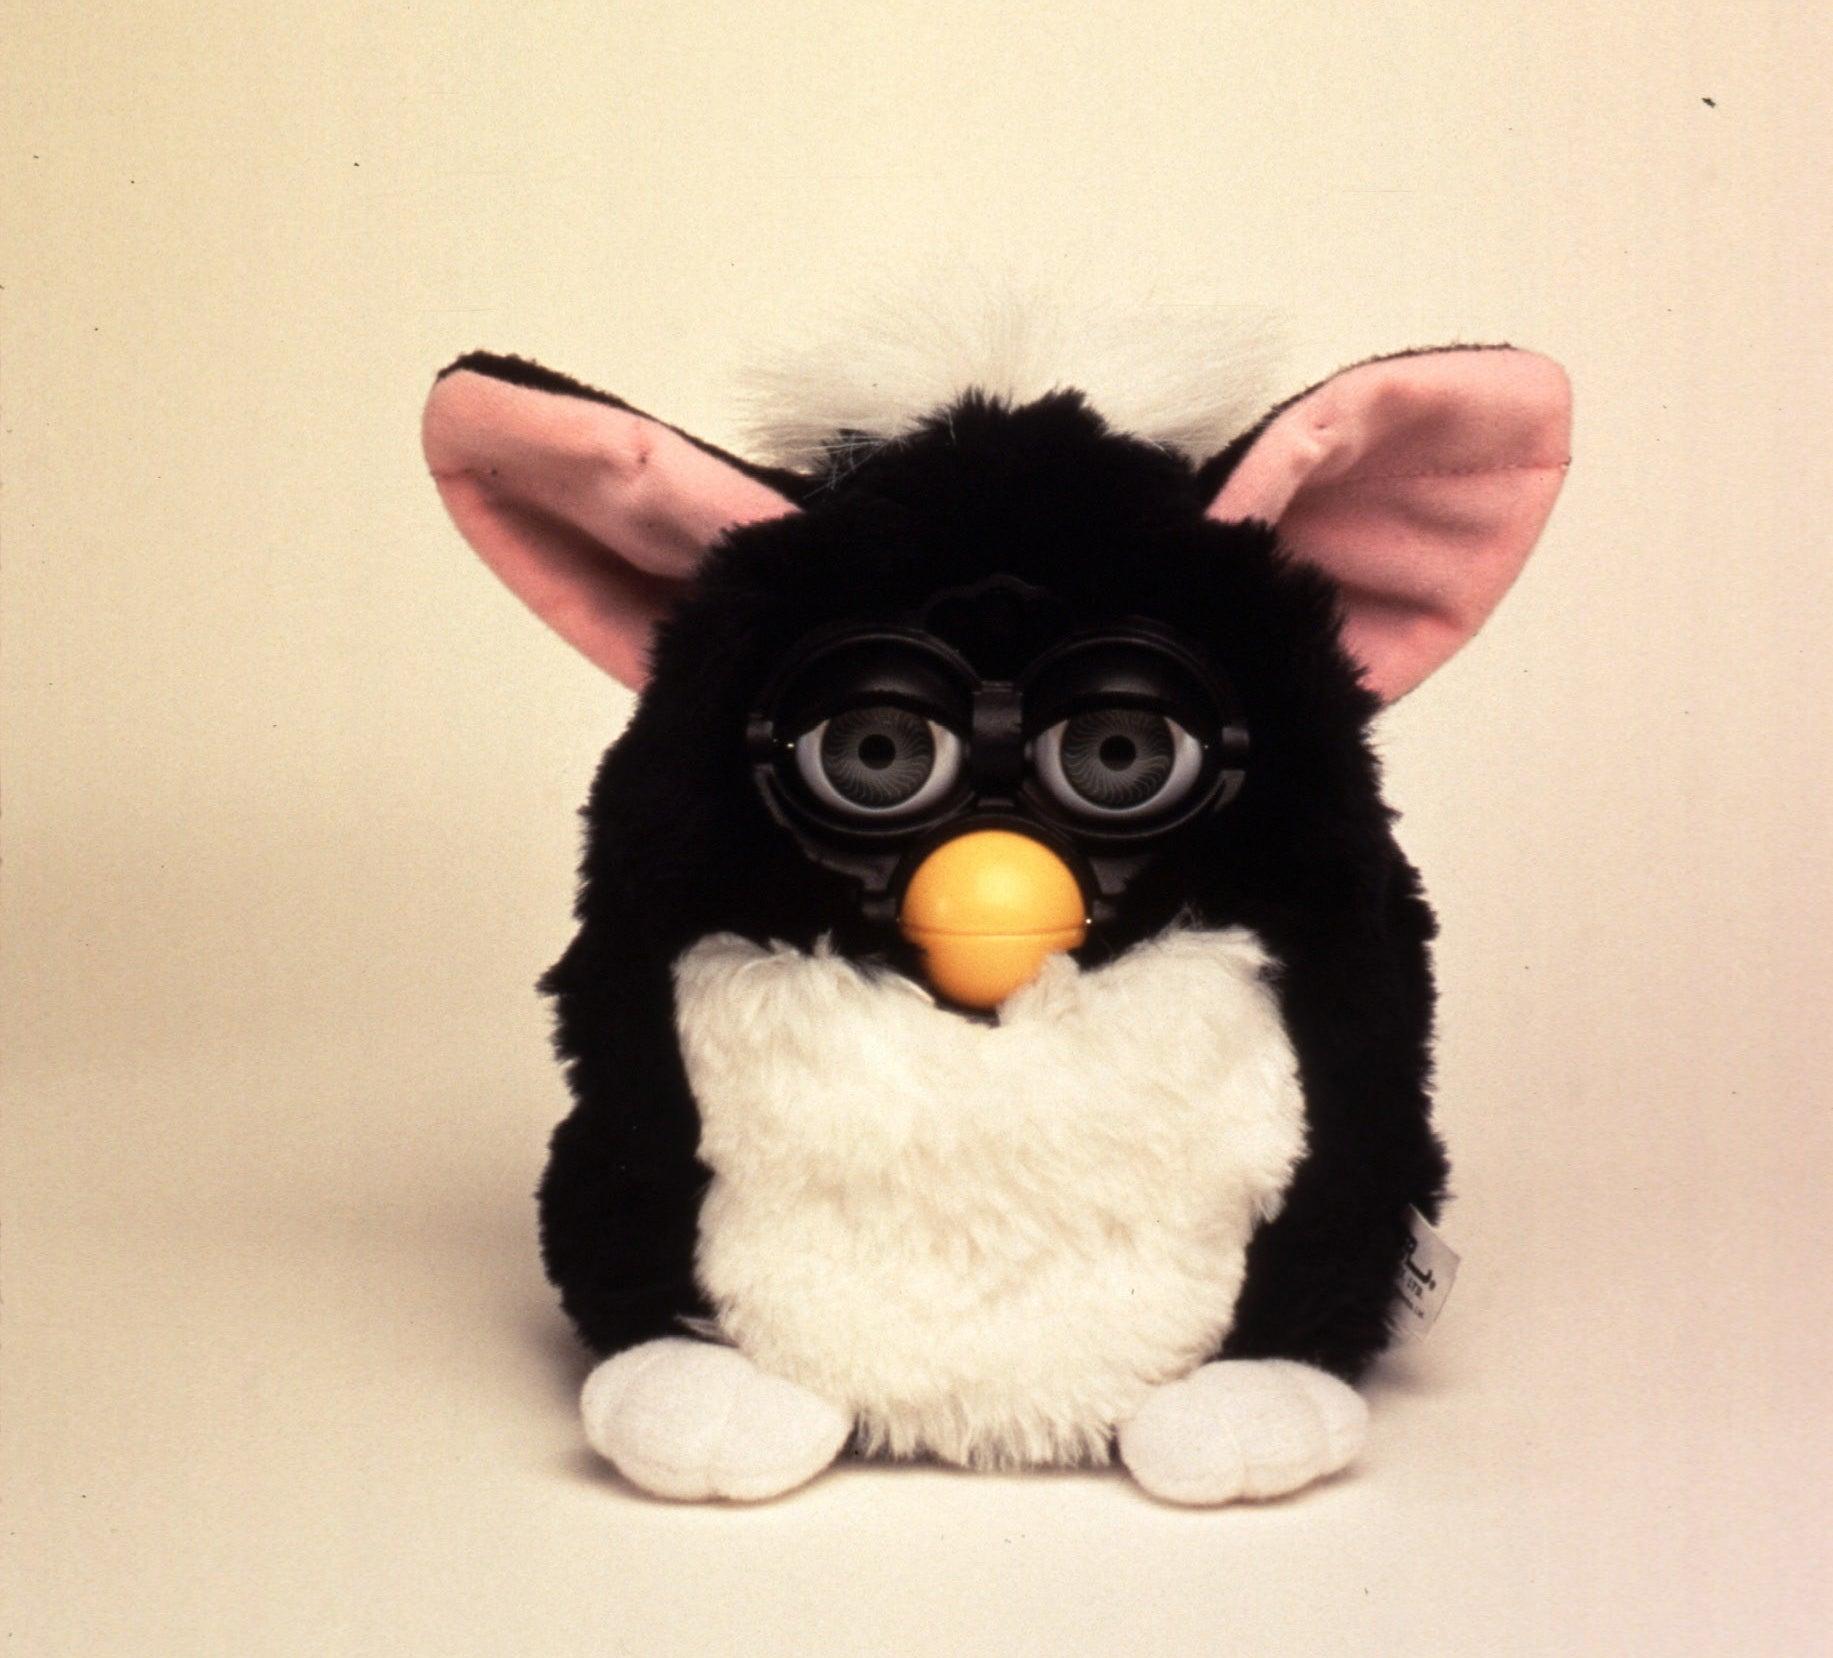 A photo of Furby